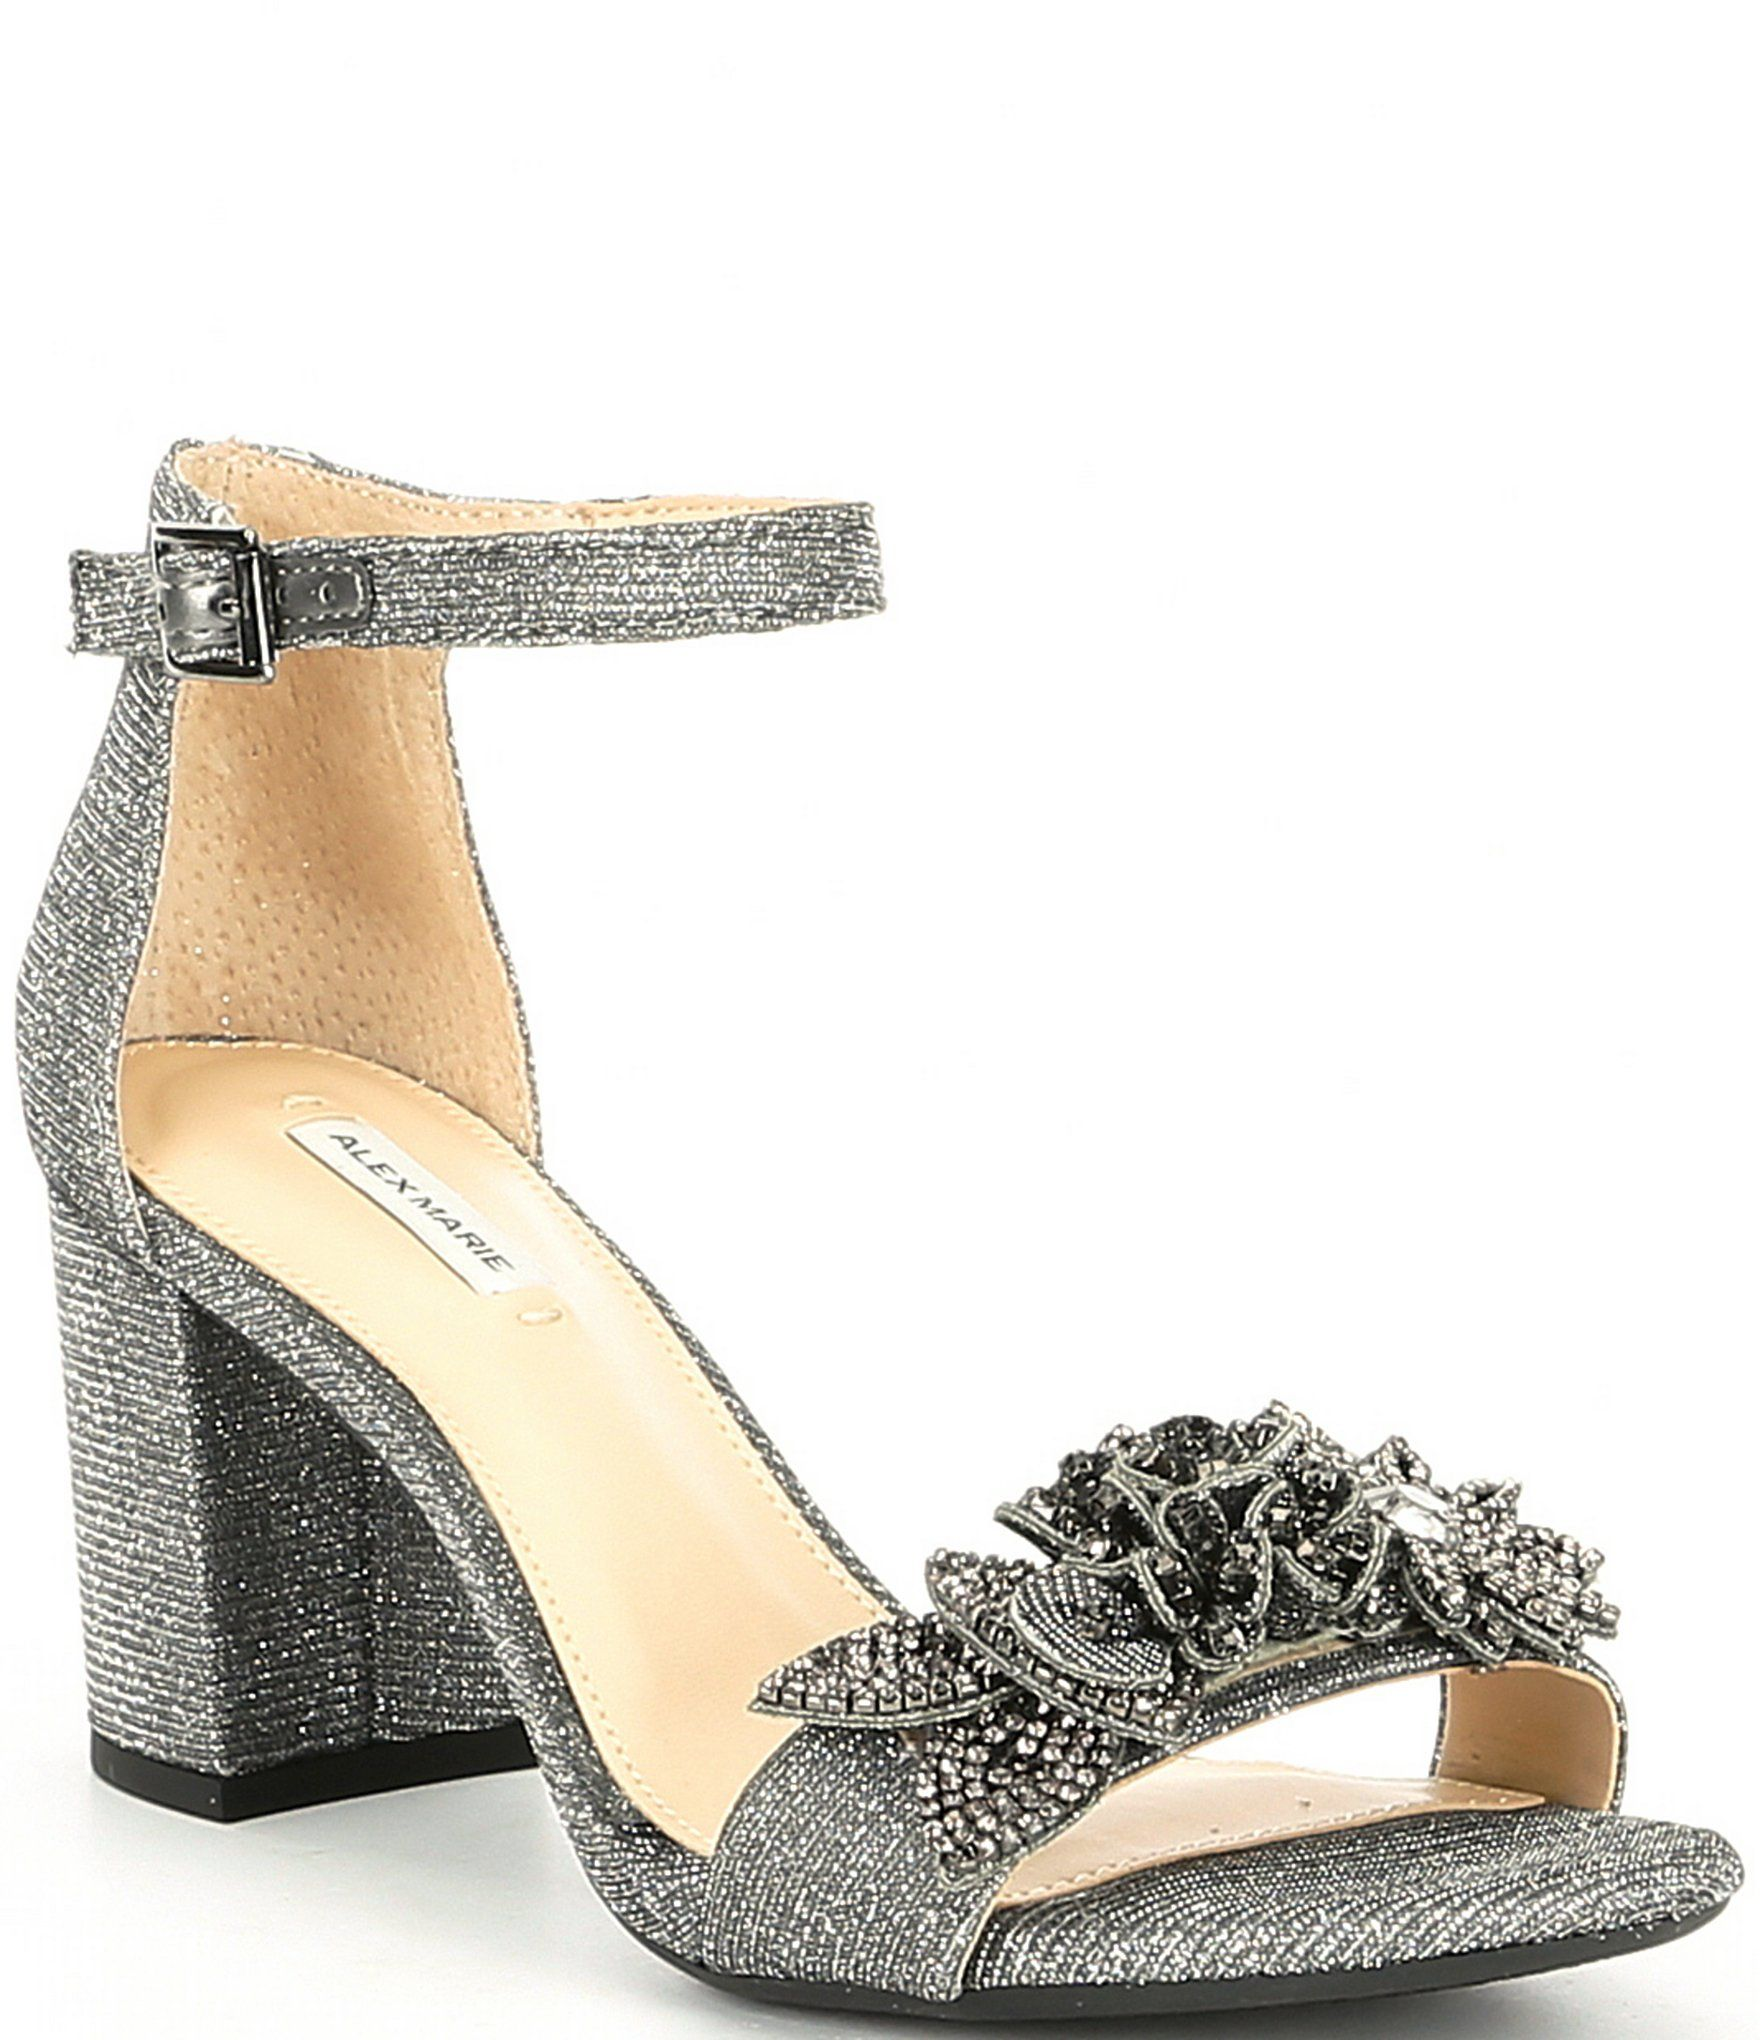 Alex marie harlean block heel dress sandals dillards in